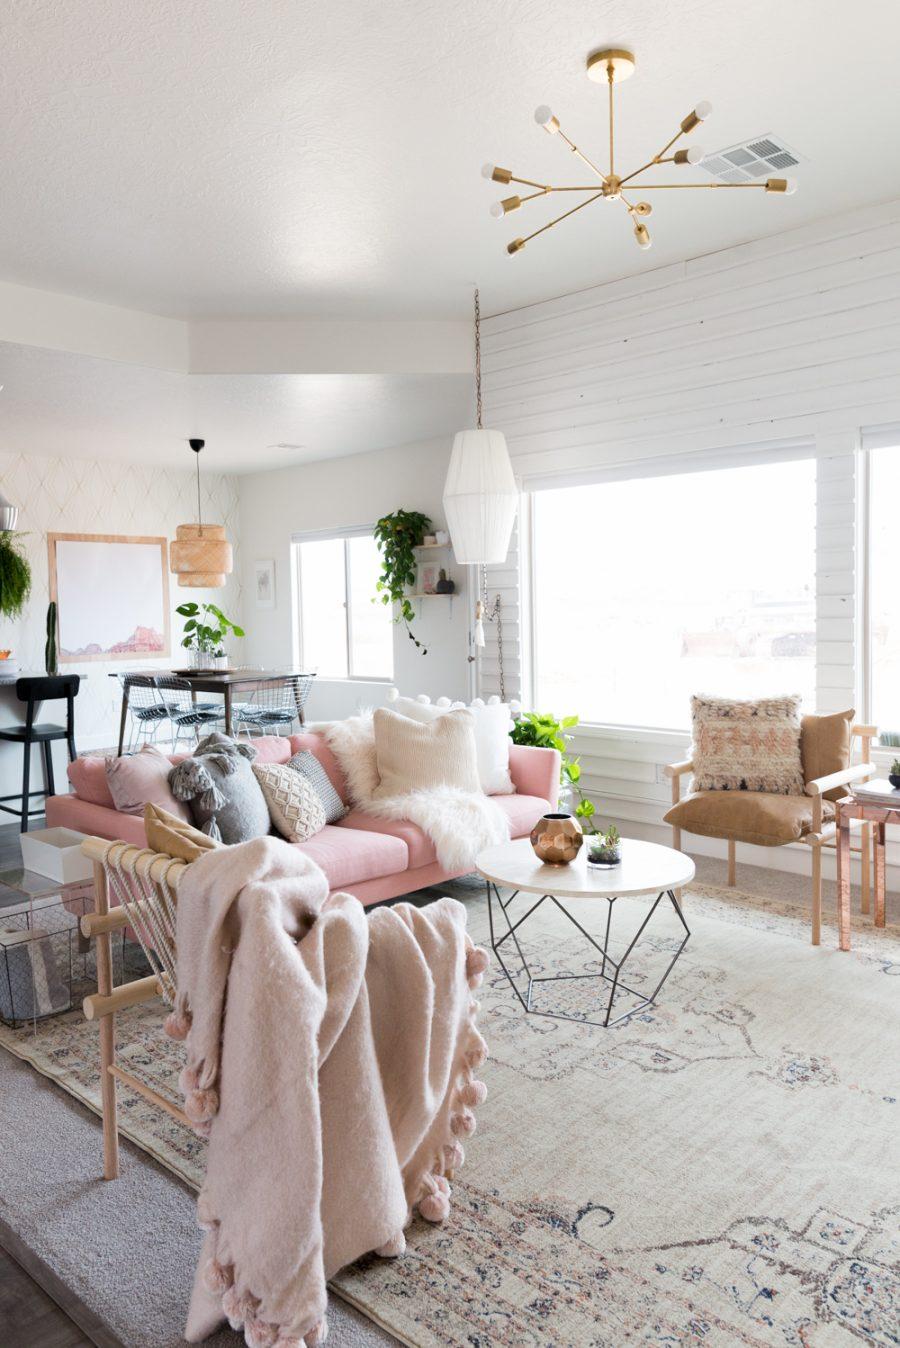 Copy Cat Chic Room Redo | Valentine's Inspired Living Room